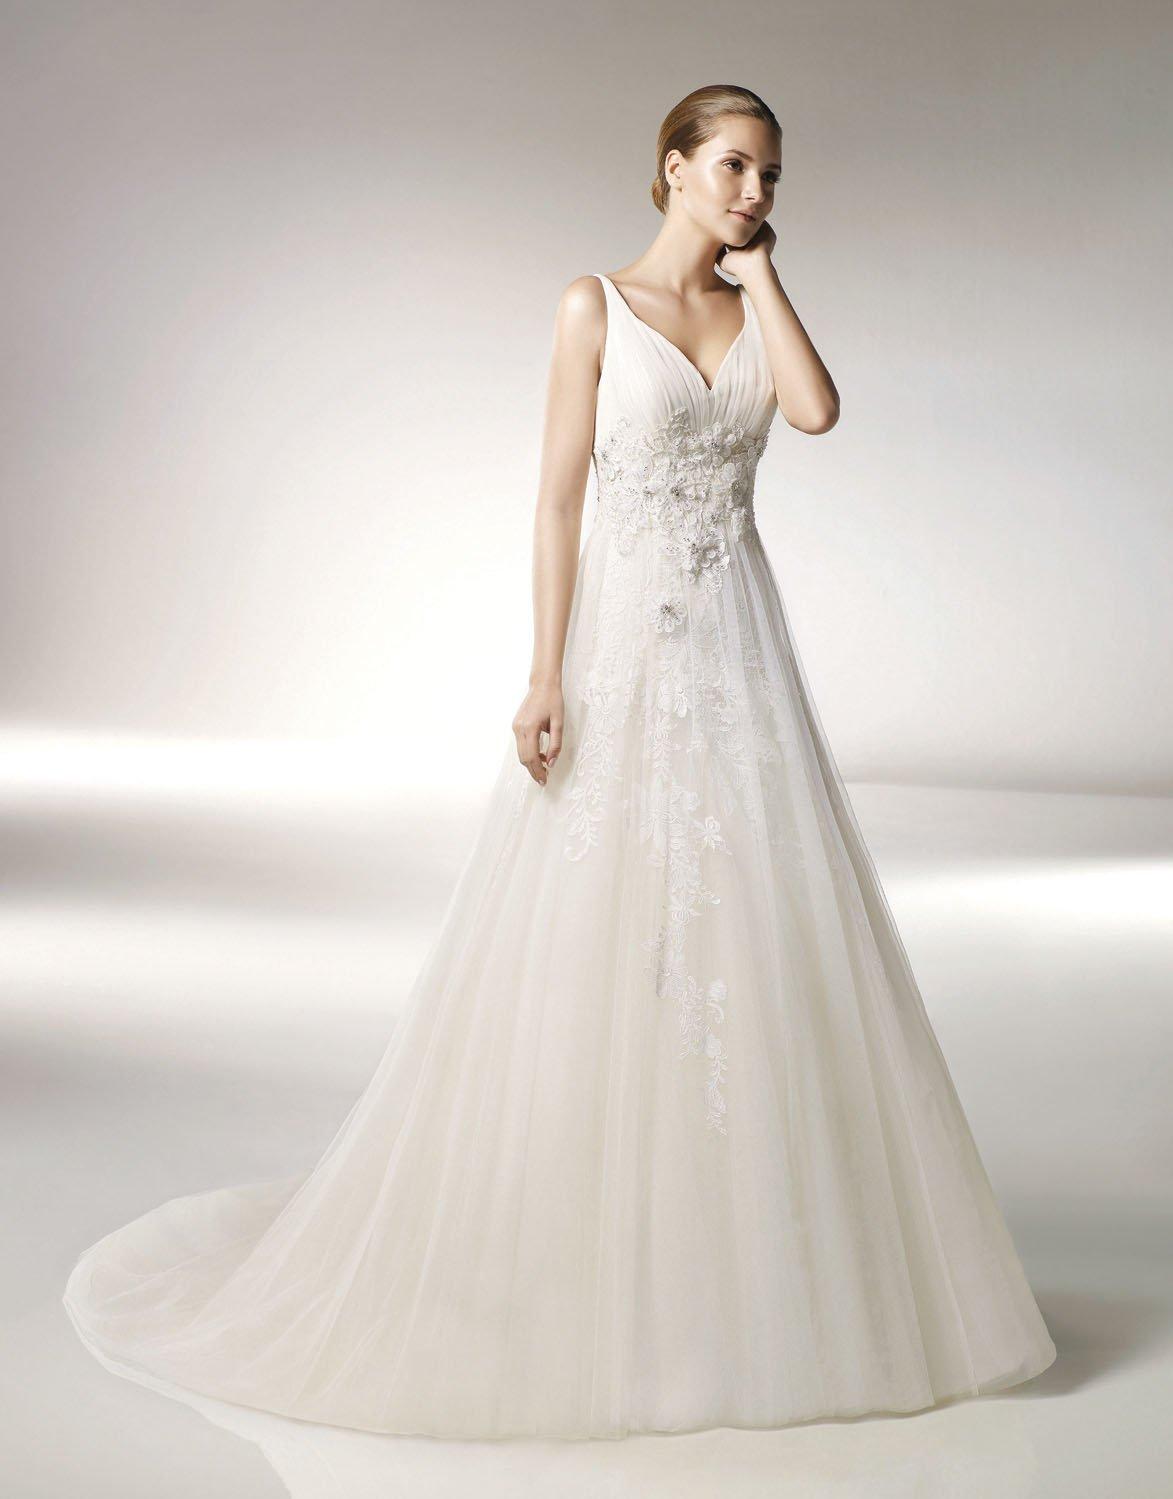 Cap Sleeve V-neckline Appliqued Beading Tuller Wedding Dress Bridal Gown aq0039